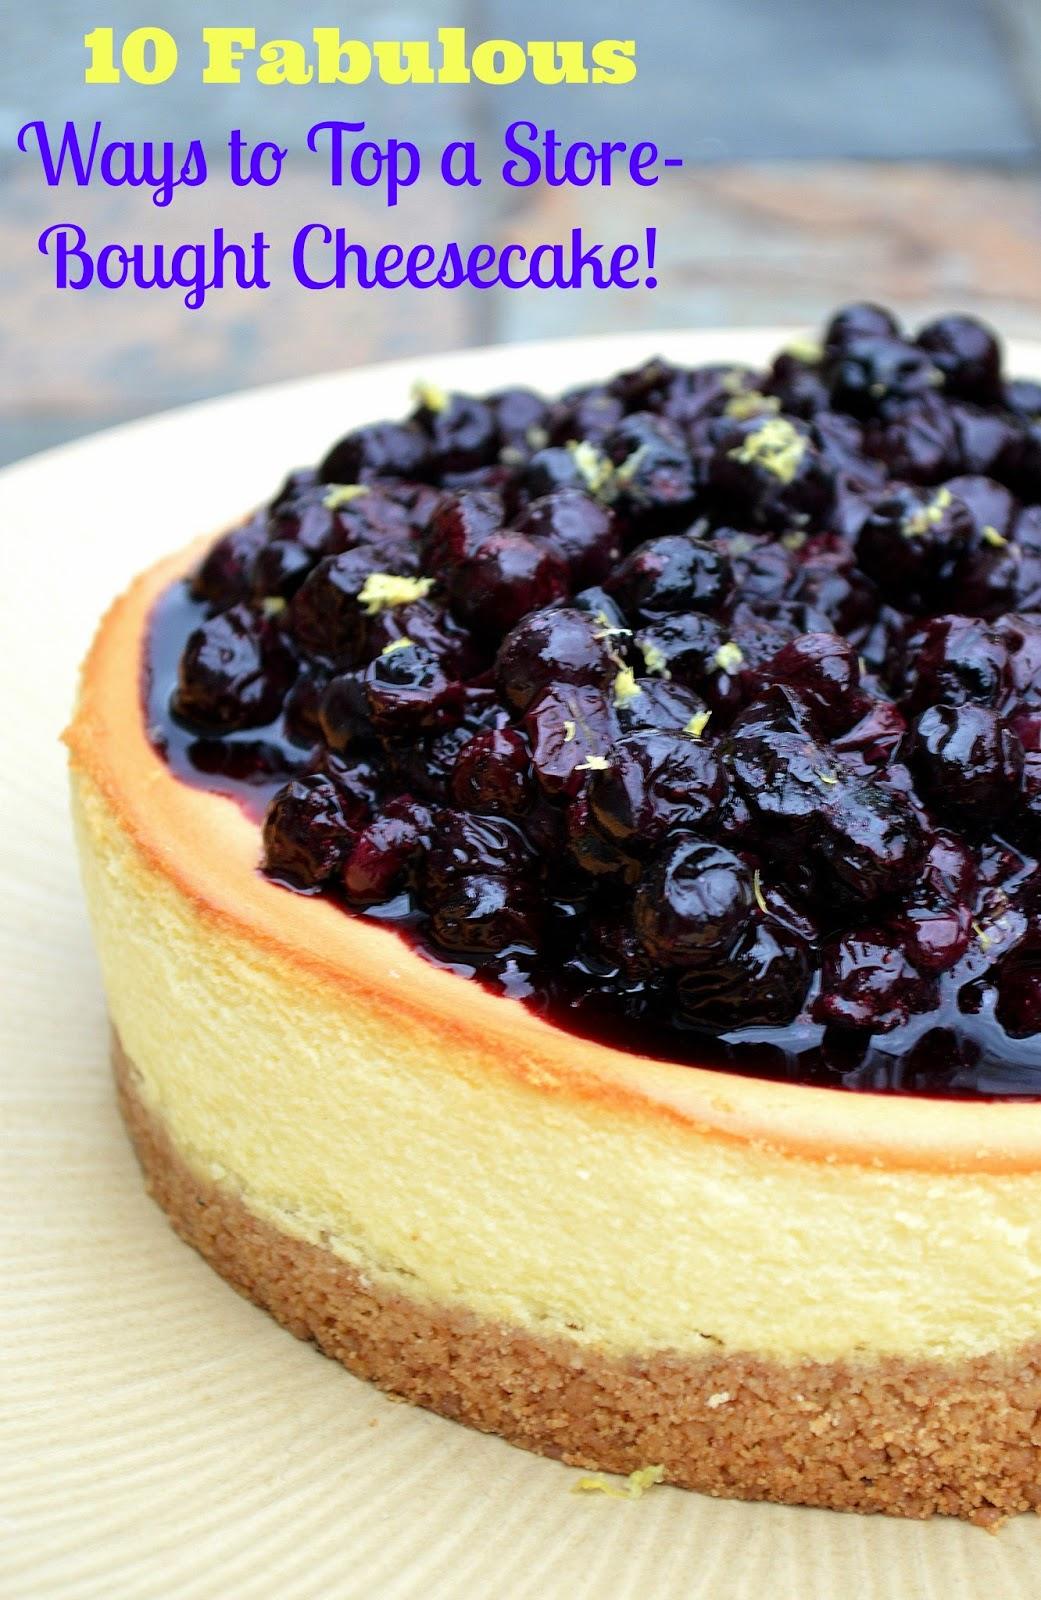 how to make homemade cheesecake topping